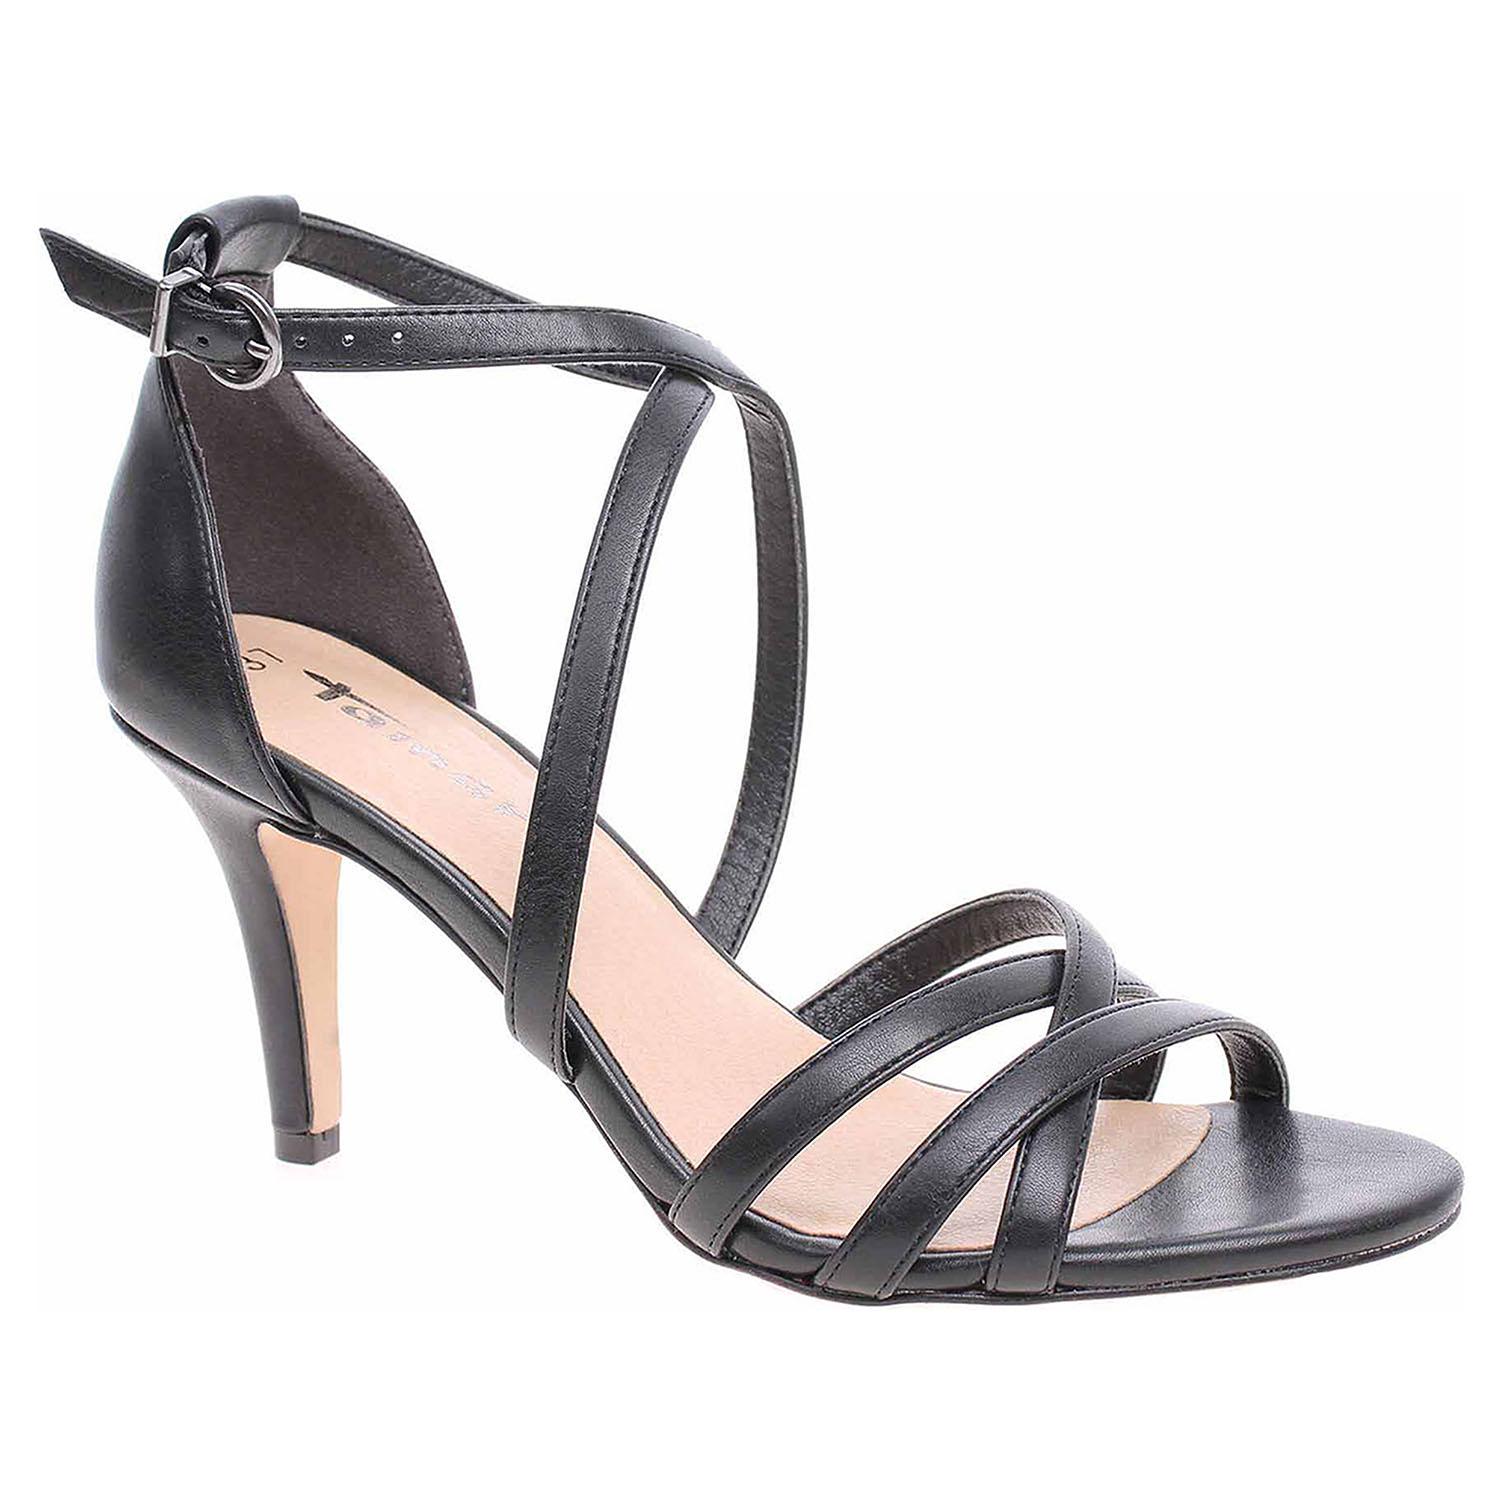 Dámská společenská obuv Tamaris 1-28302-31 black matt 1-1-28302-31 020 39